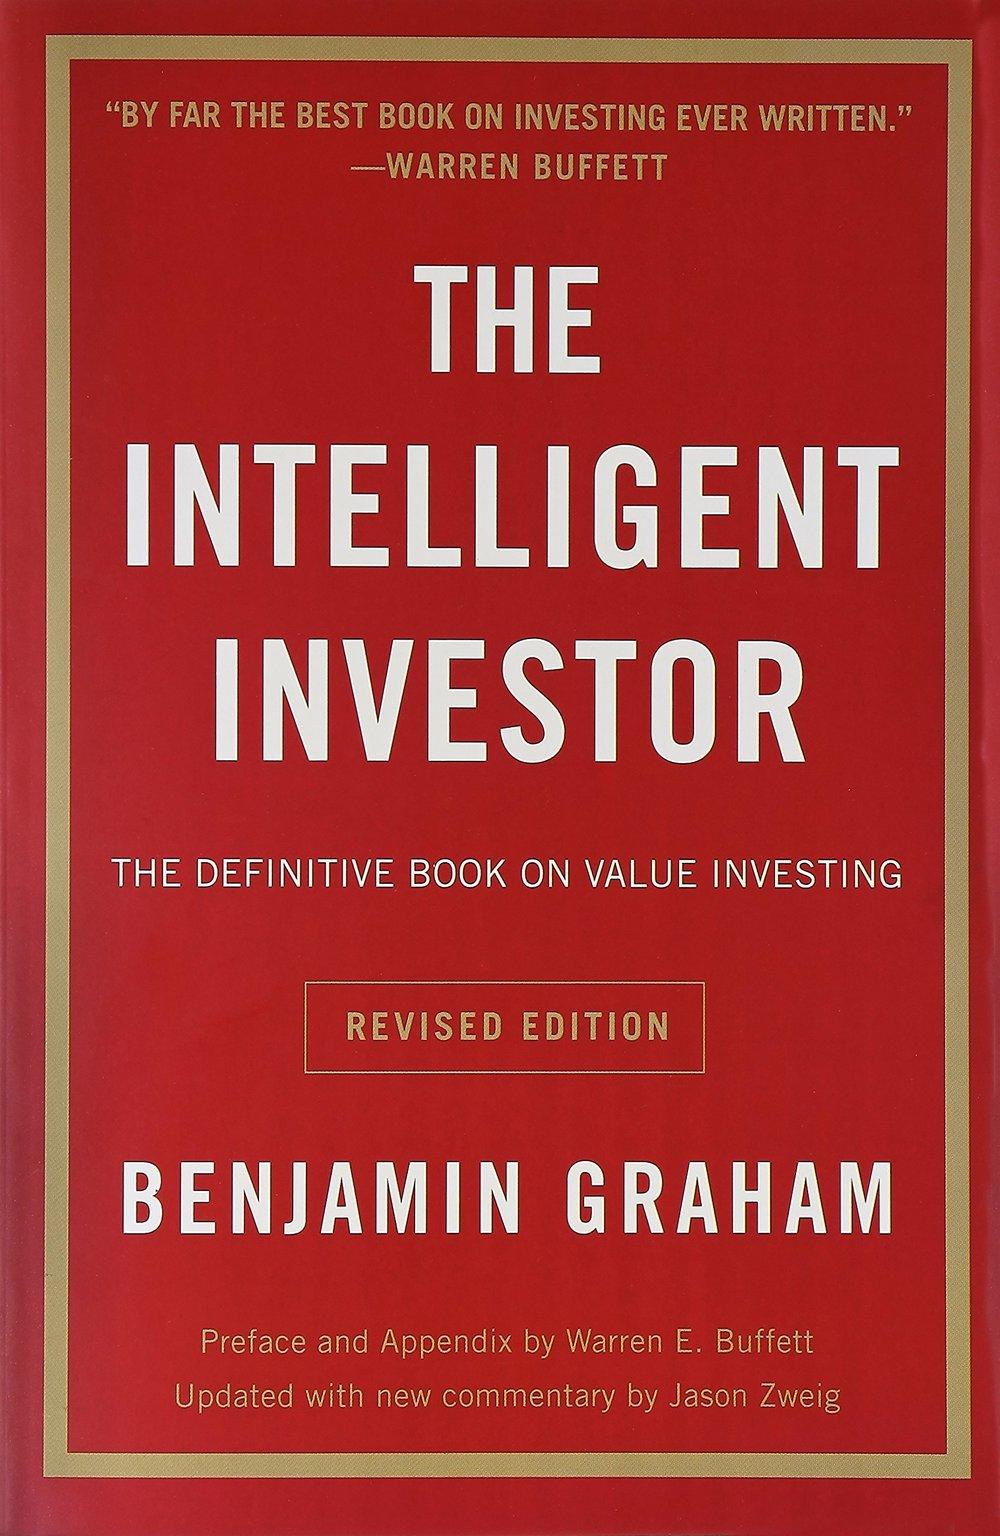 THE INTELLIGENT INVESTOR - By: Benjamin Graham